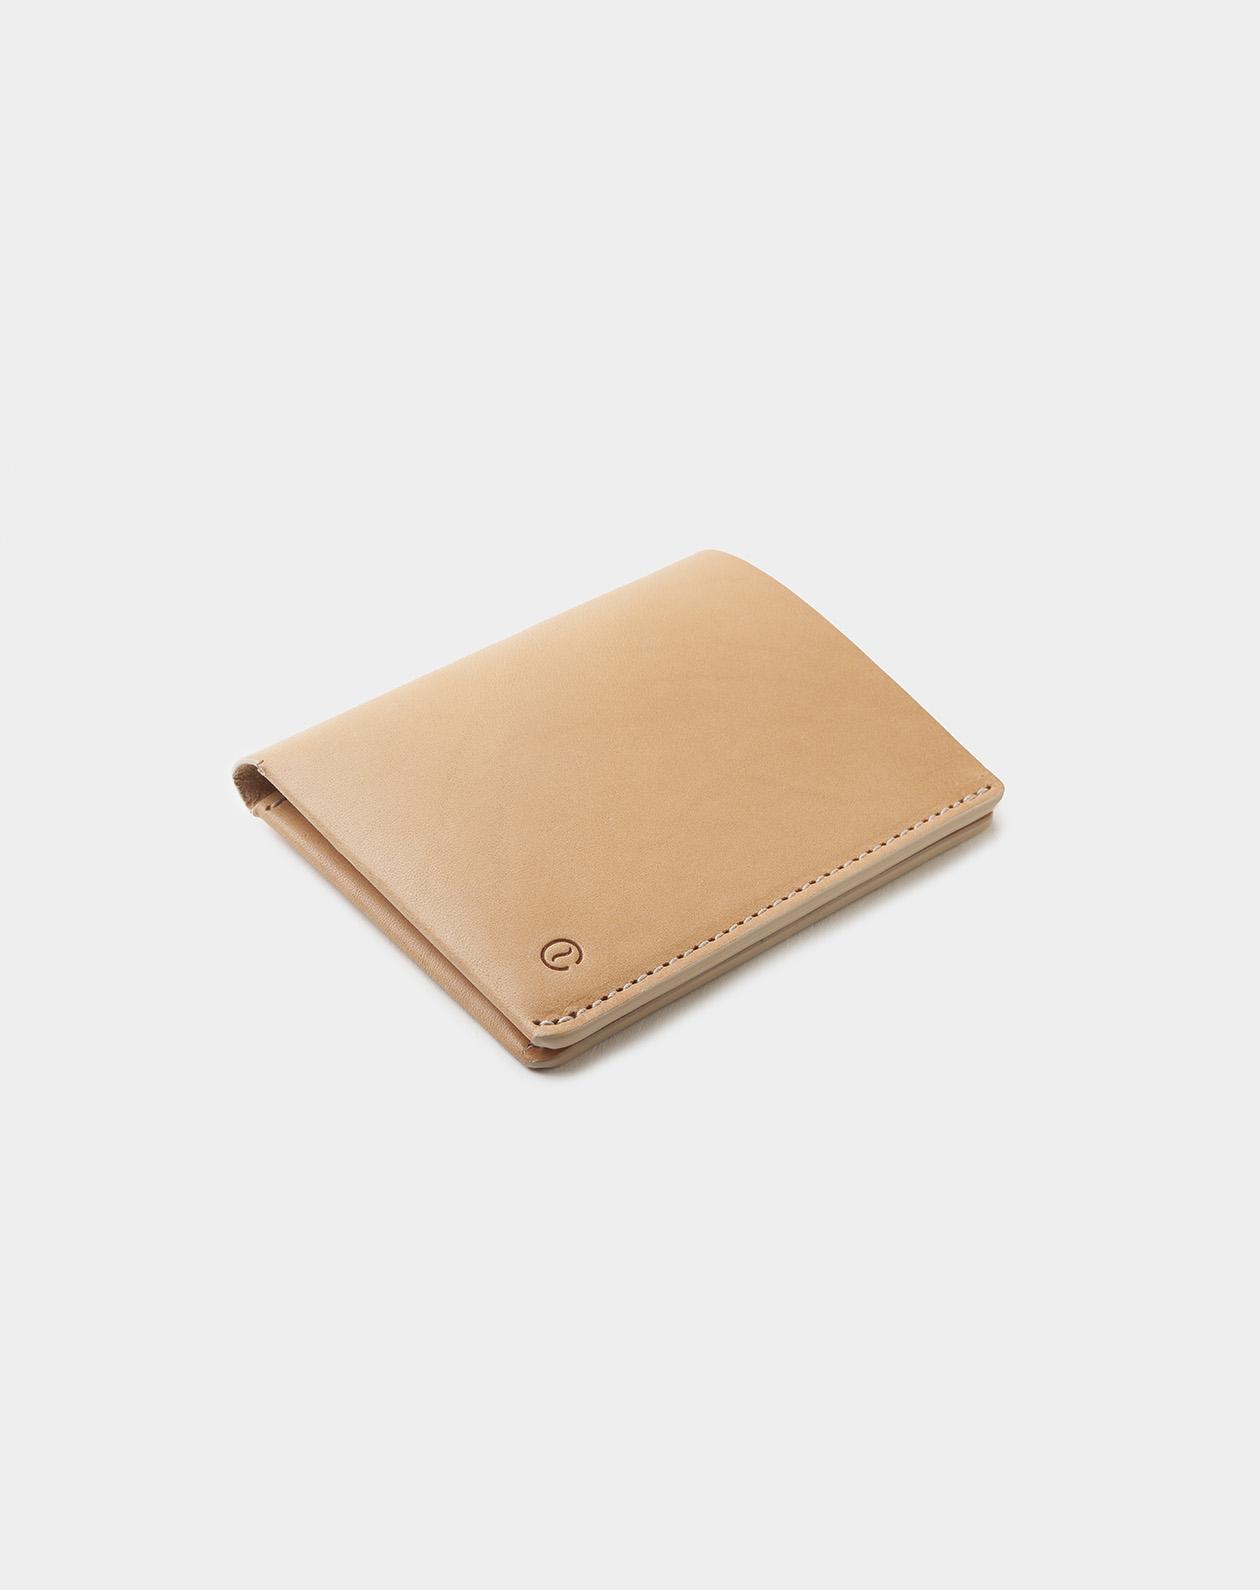 Ultra slim natural wallet diagonal in natural